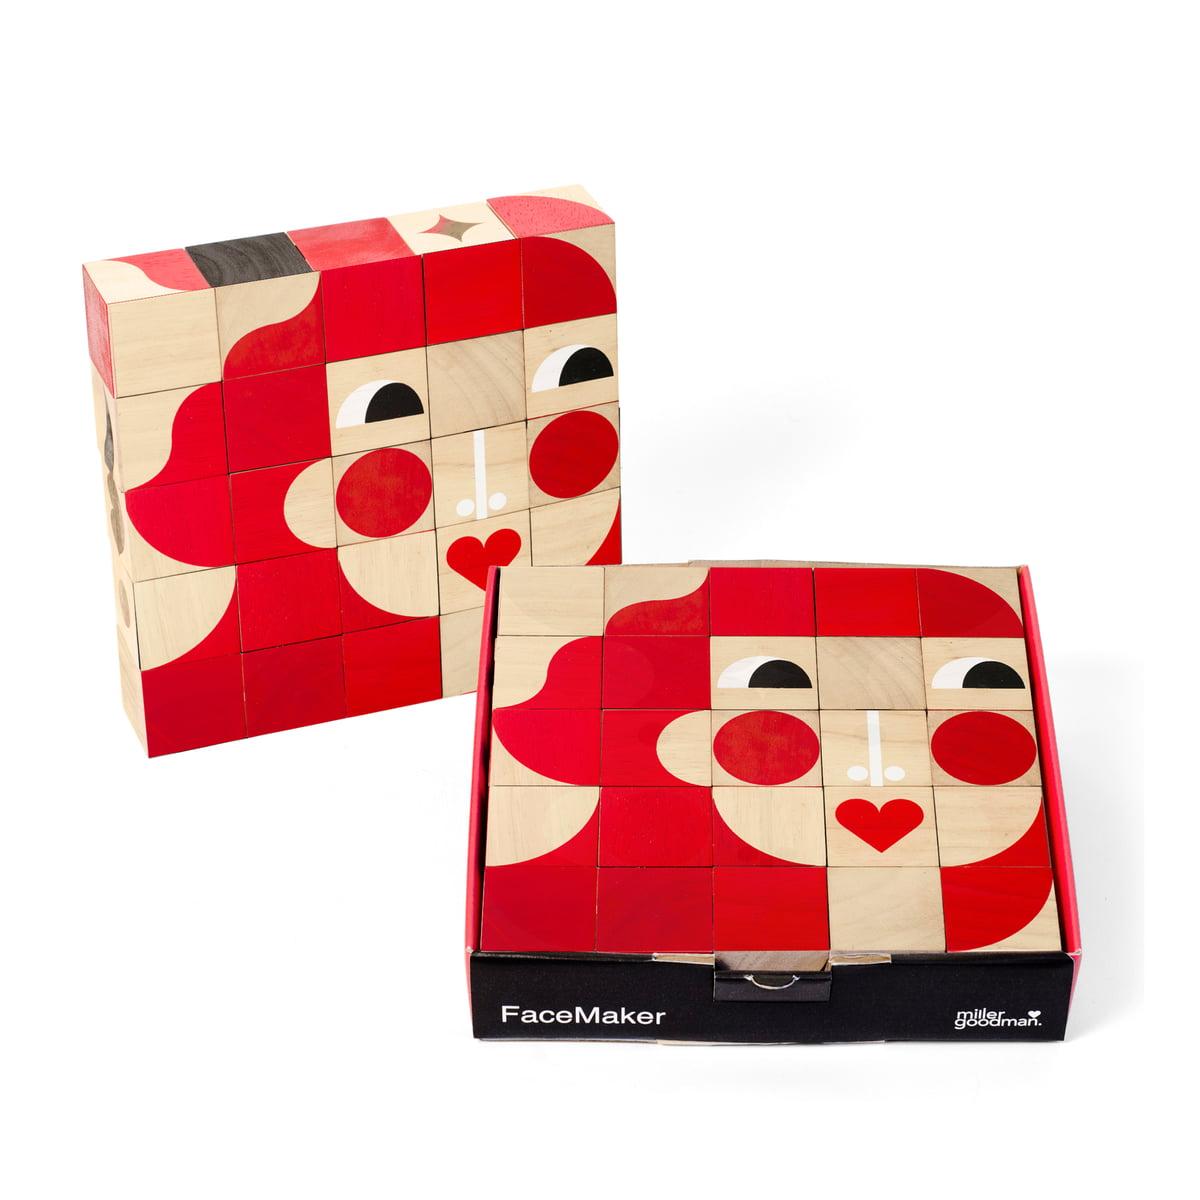 Miller Goodman - Mini FaceMaker Holzspielzeug | Kinderzimmer > Spielzeuge > Holzspielzeuge | Miller Goodman